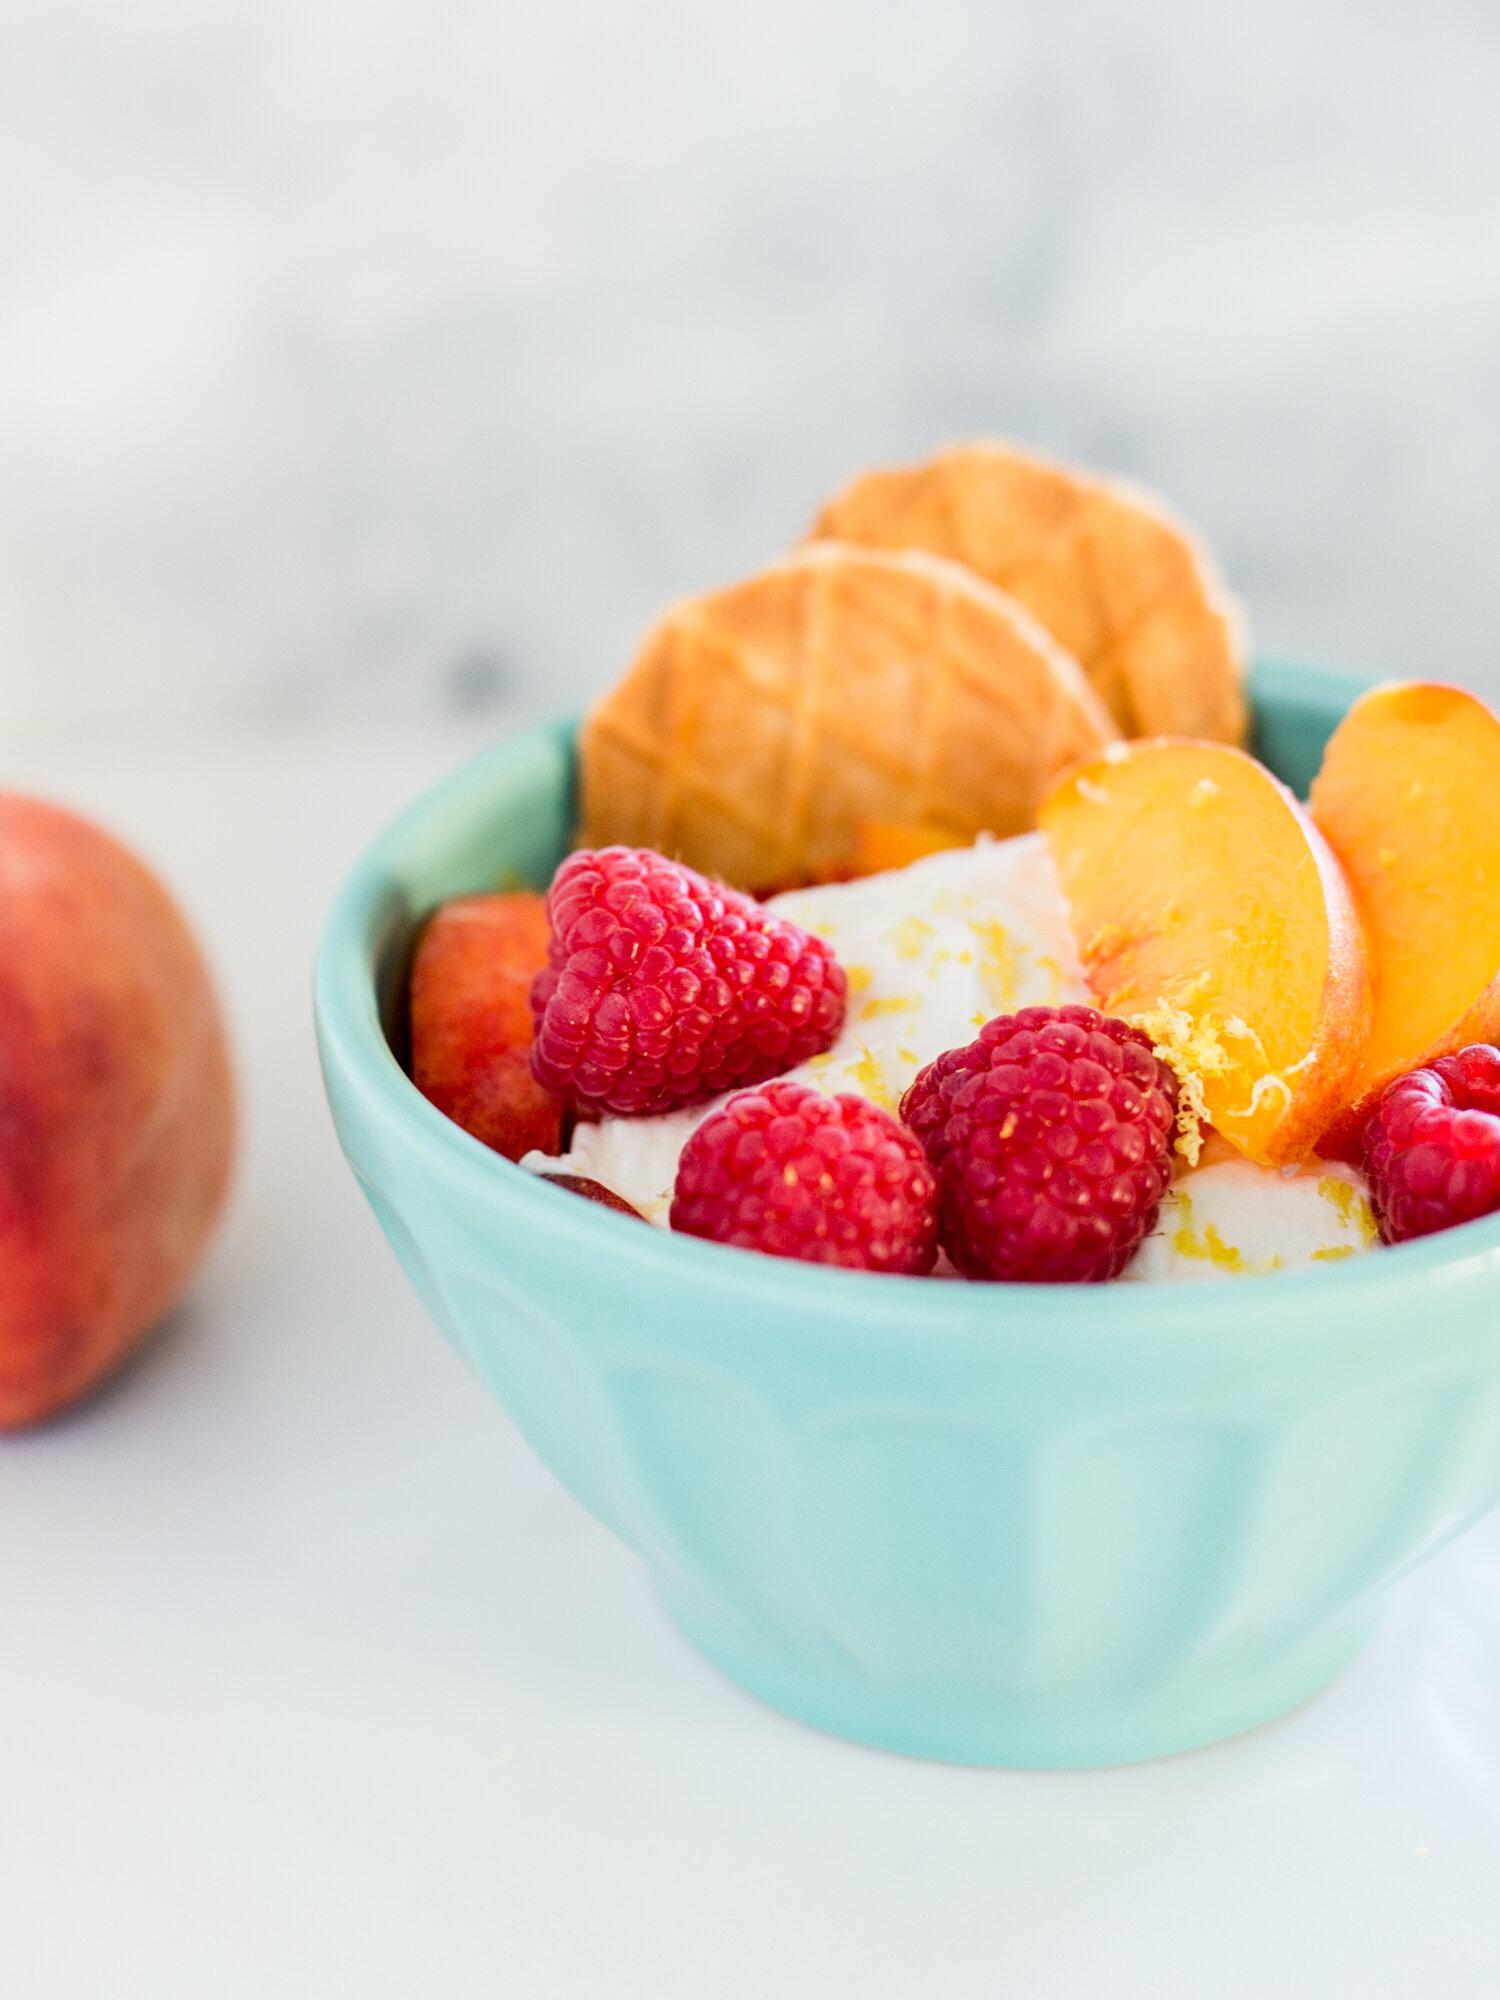 Peach and Raspberry Dessert from Golden Coil Blog